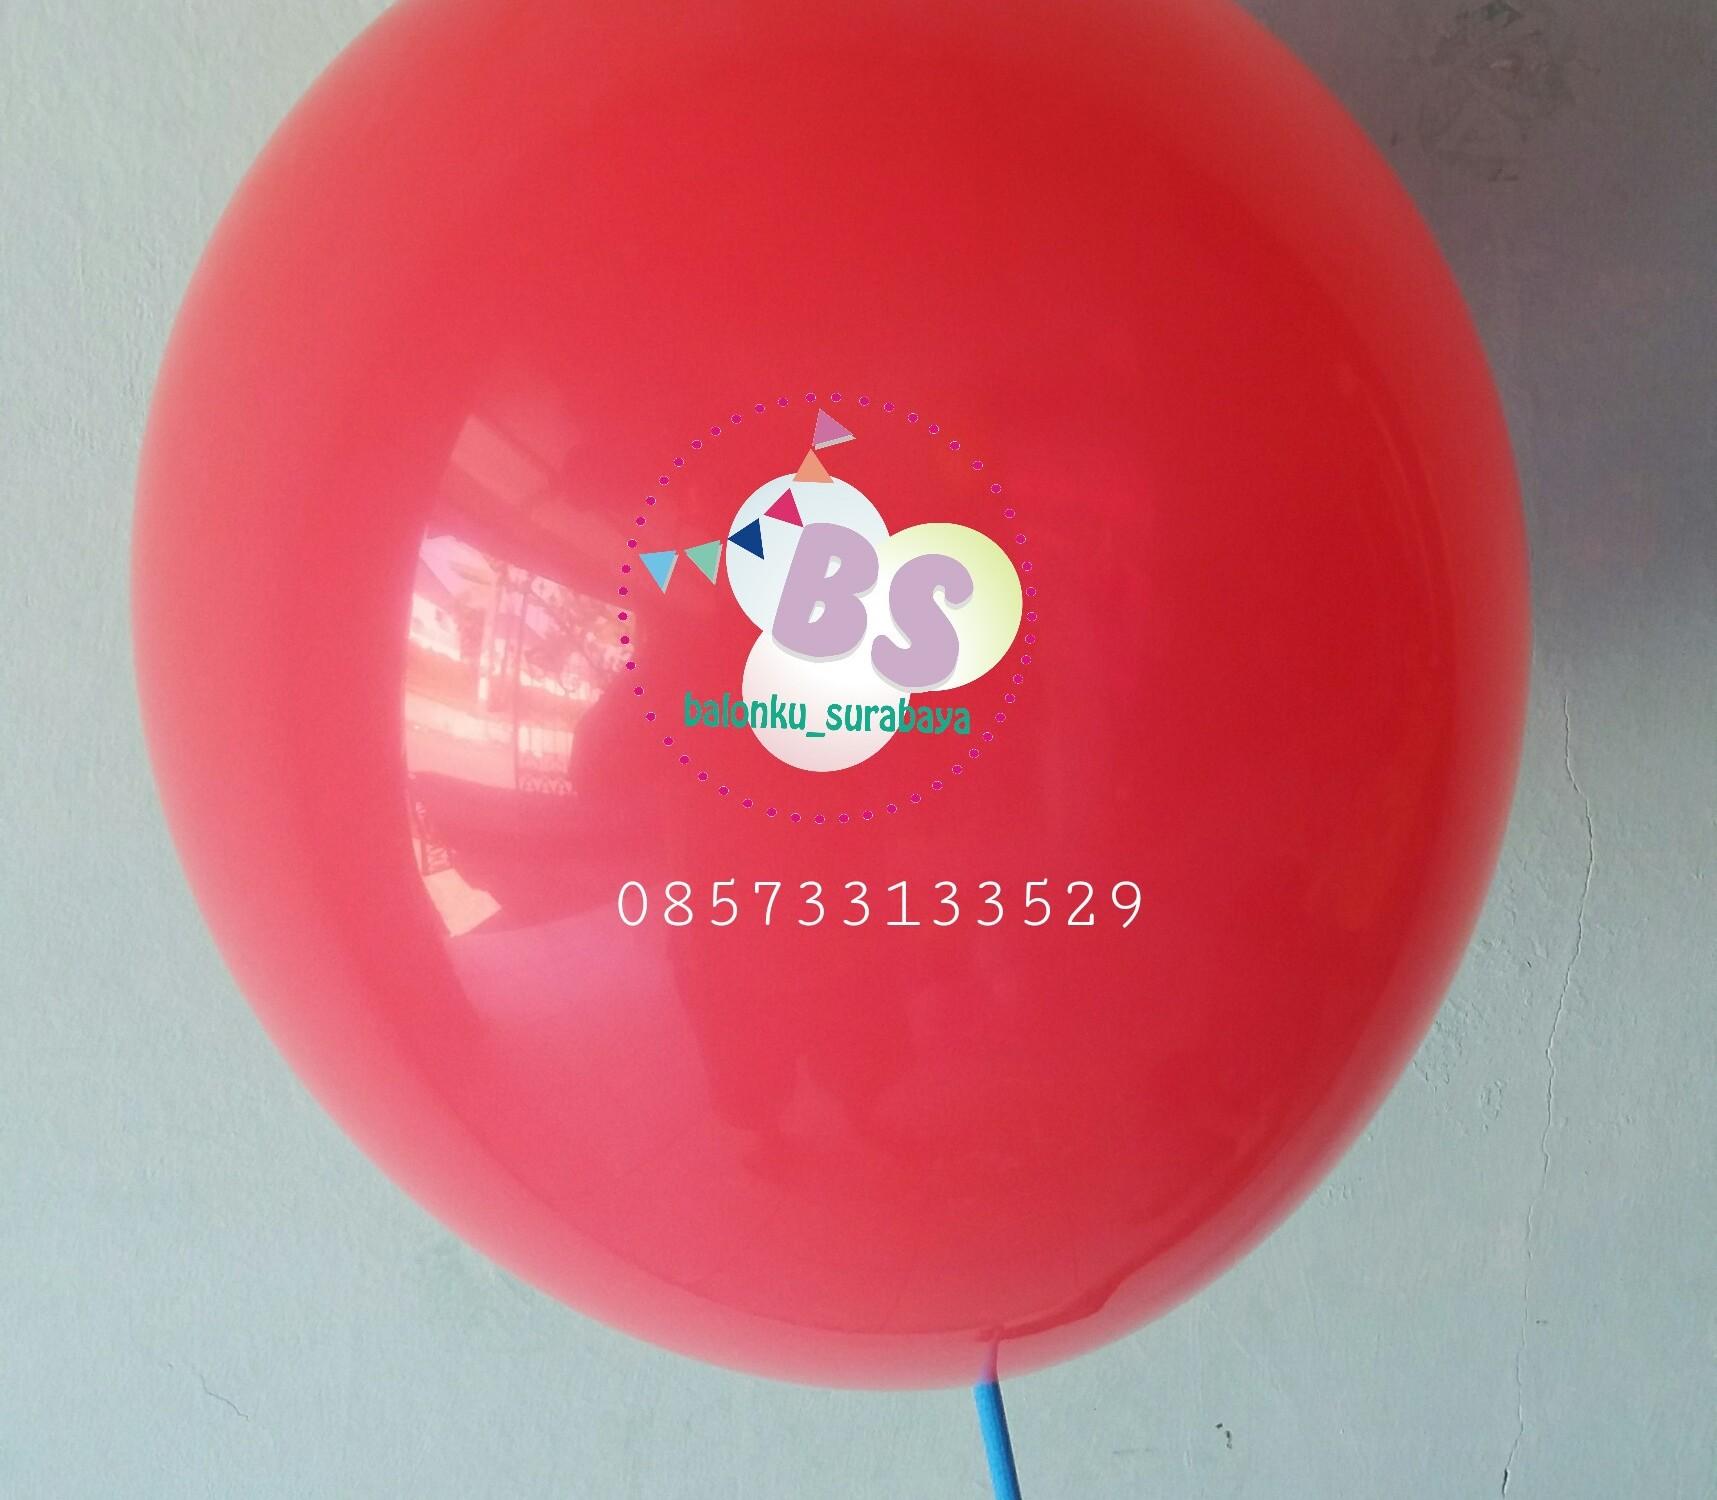 balon latex merah, balon doff, balon latex doff, balon ulang tahun, balon dekorasi, balon foil, balon metalik, balon twist, balon latex, balon huruf, balon angka, supplier balon, dekorasi balon, sablon balon, confetti, bendera ulang tahun, balon LED, lampion terbang